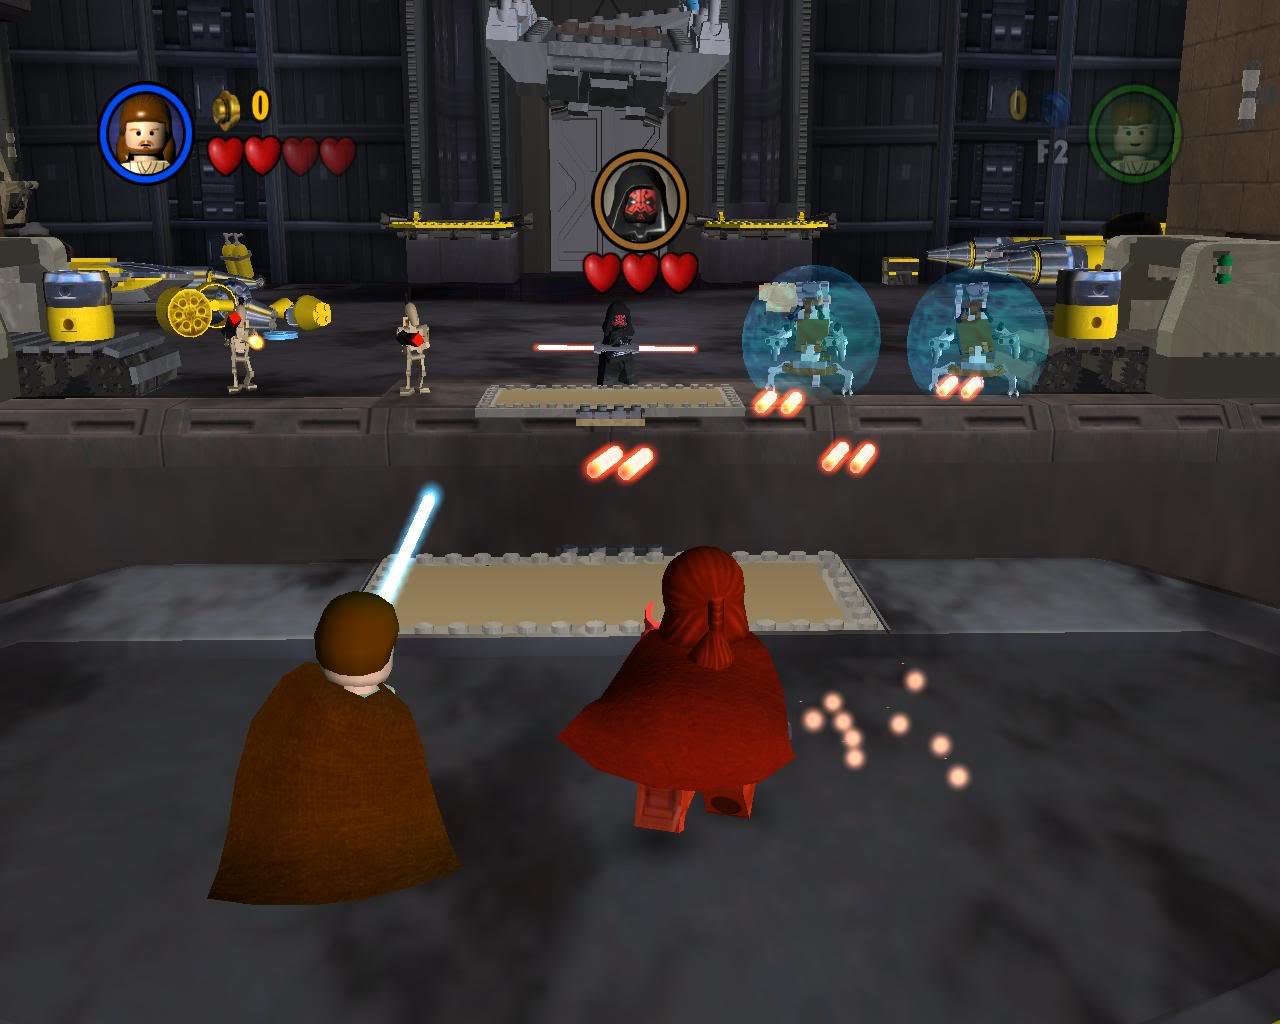 Lego Star Wars Gamecube